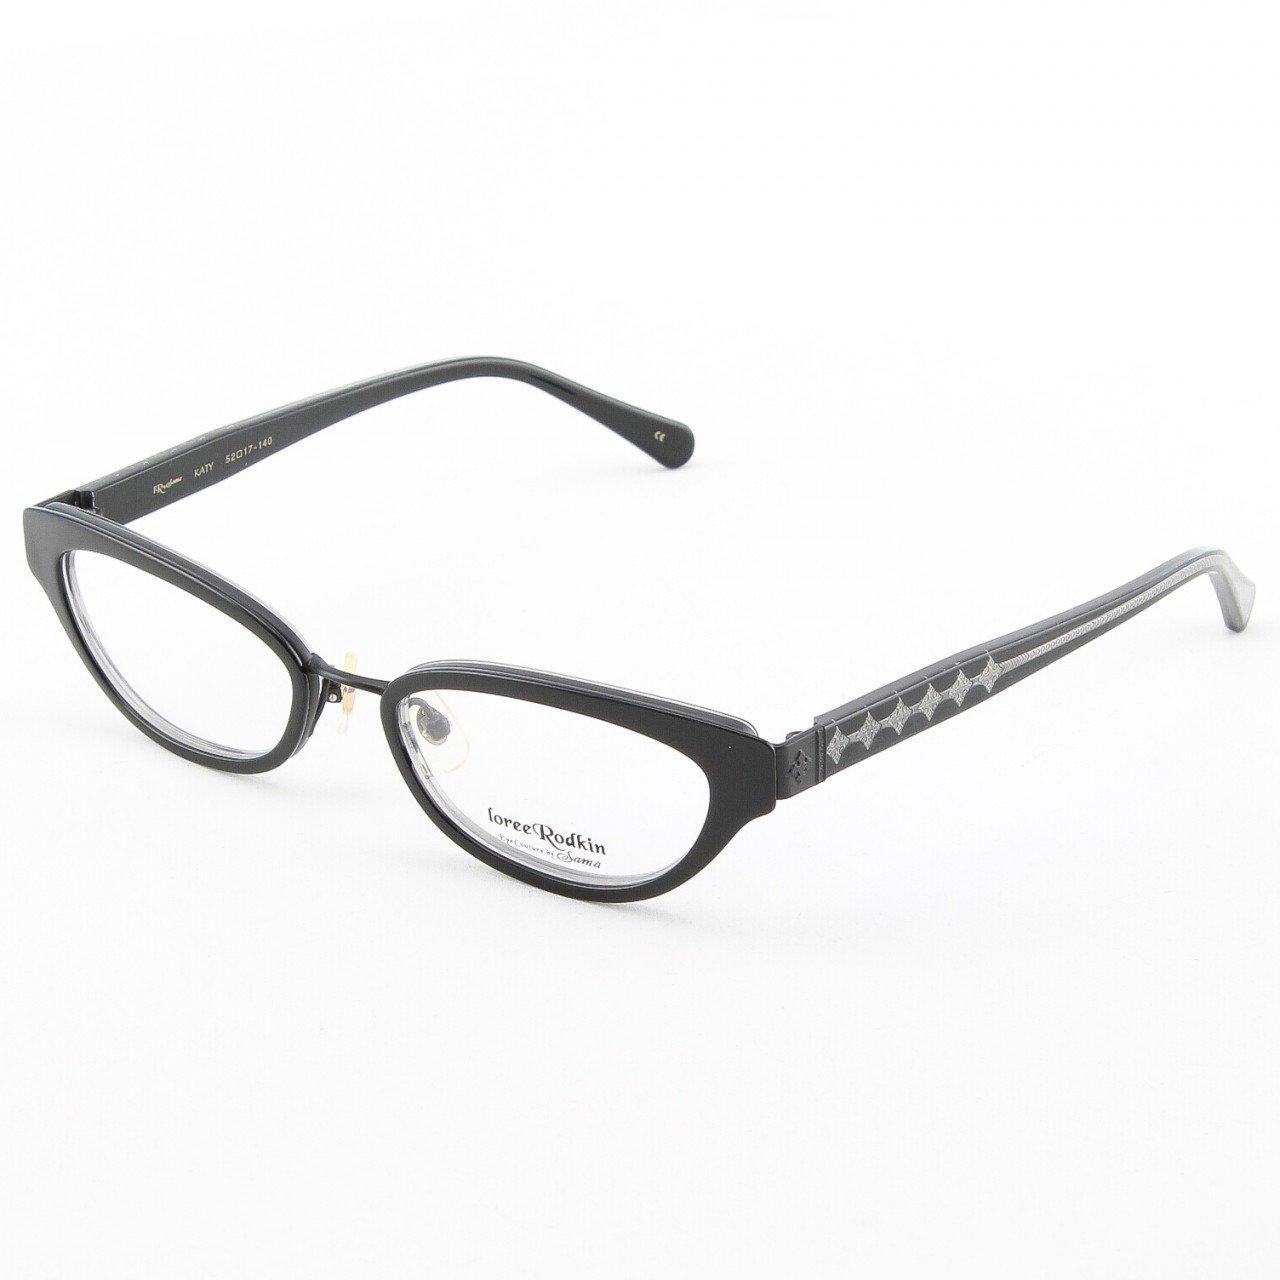 Loree Rodkin Katy Eyeglasses Onyx w/ Clear Lenses, Plastic Inserts and Decorative Temple Core